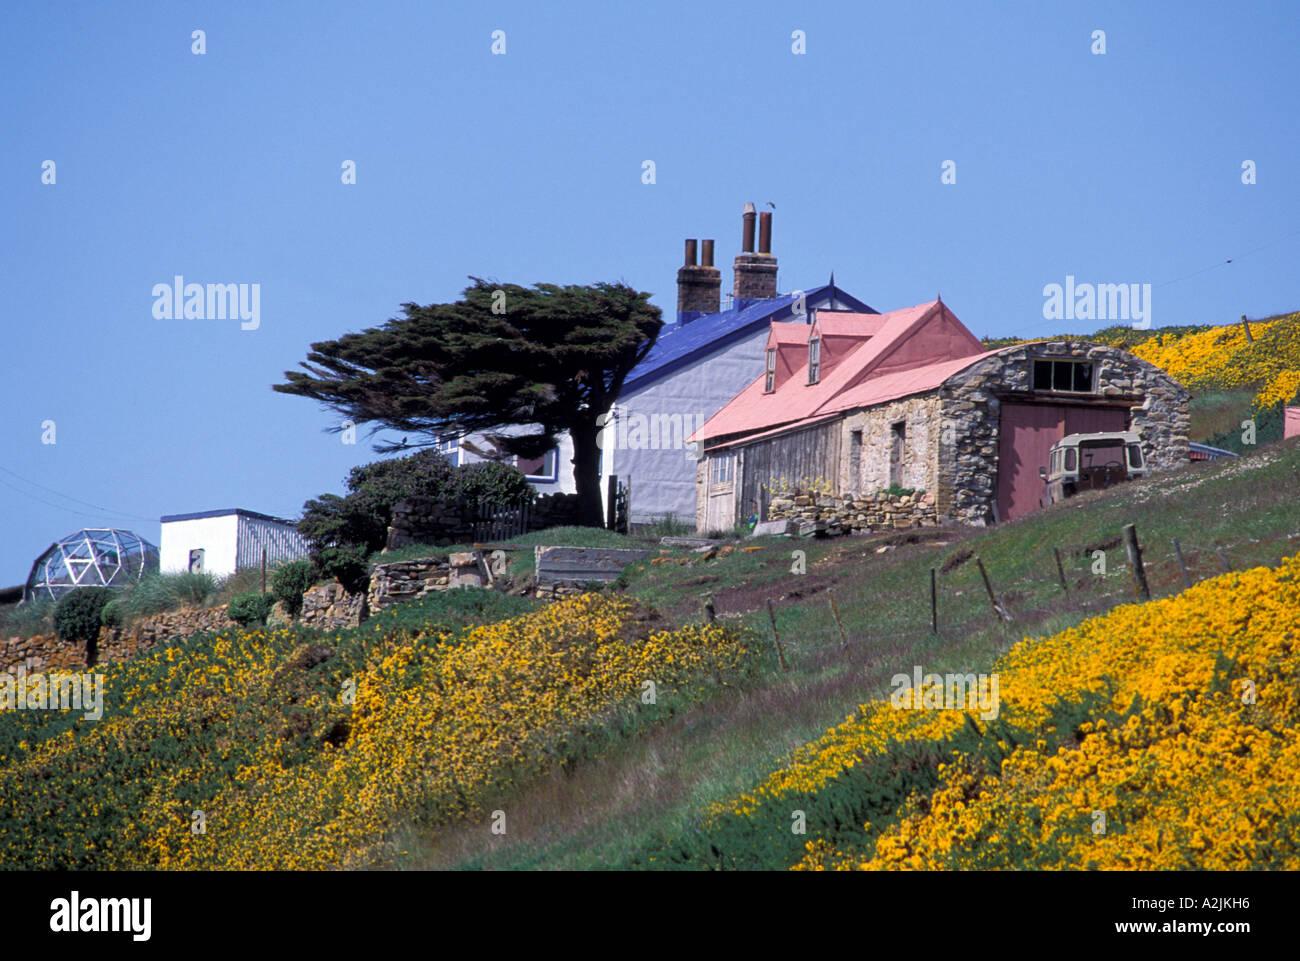 Antarctica, Sub-Antarctic Islands, South Georgia. Houses along coastline Stock Photo